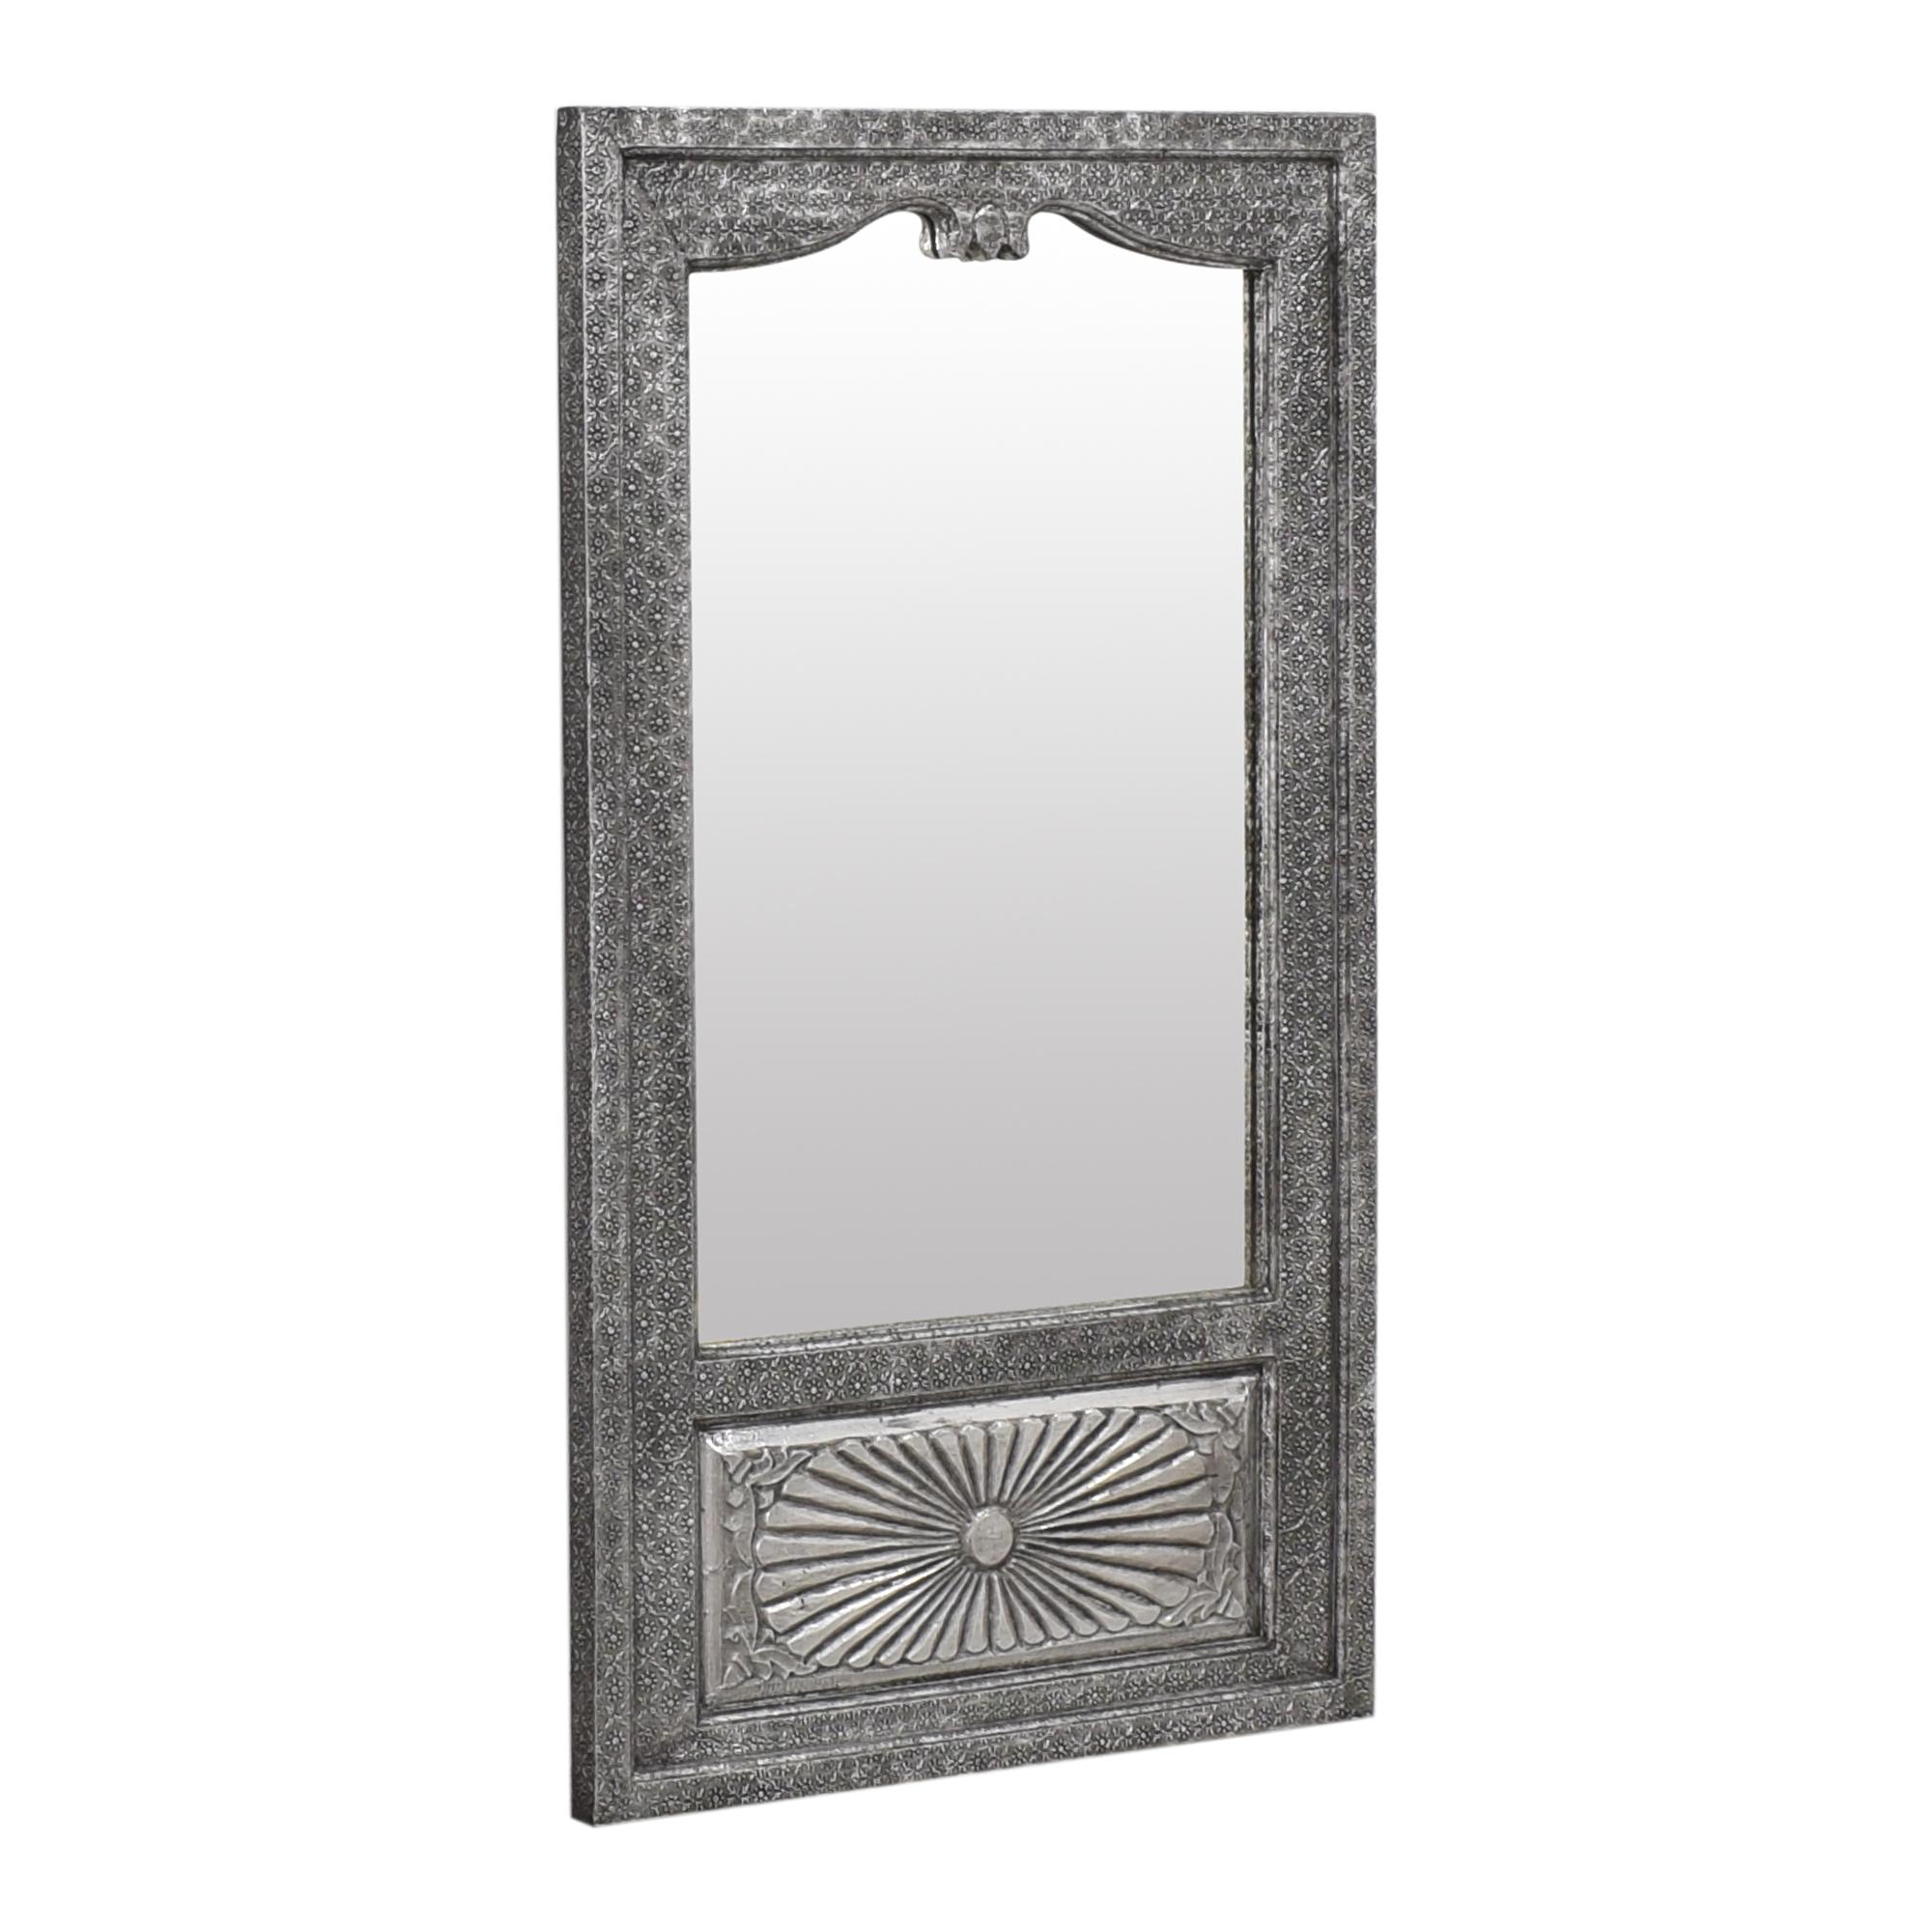 Arhaus Arhaus Moroccan-Style Wall Mirror discount